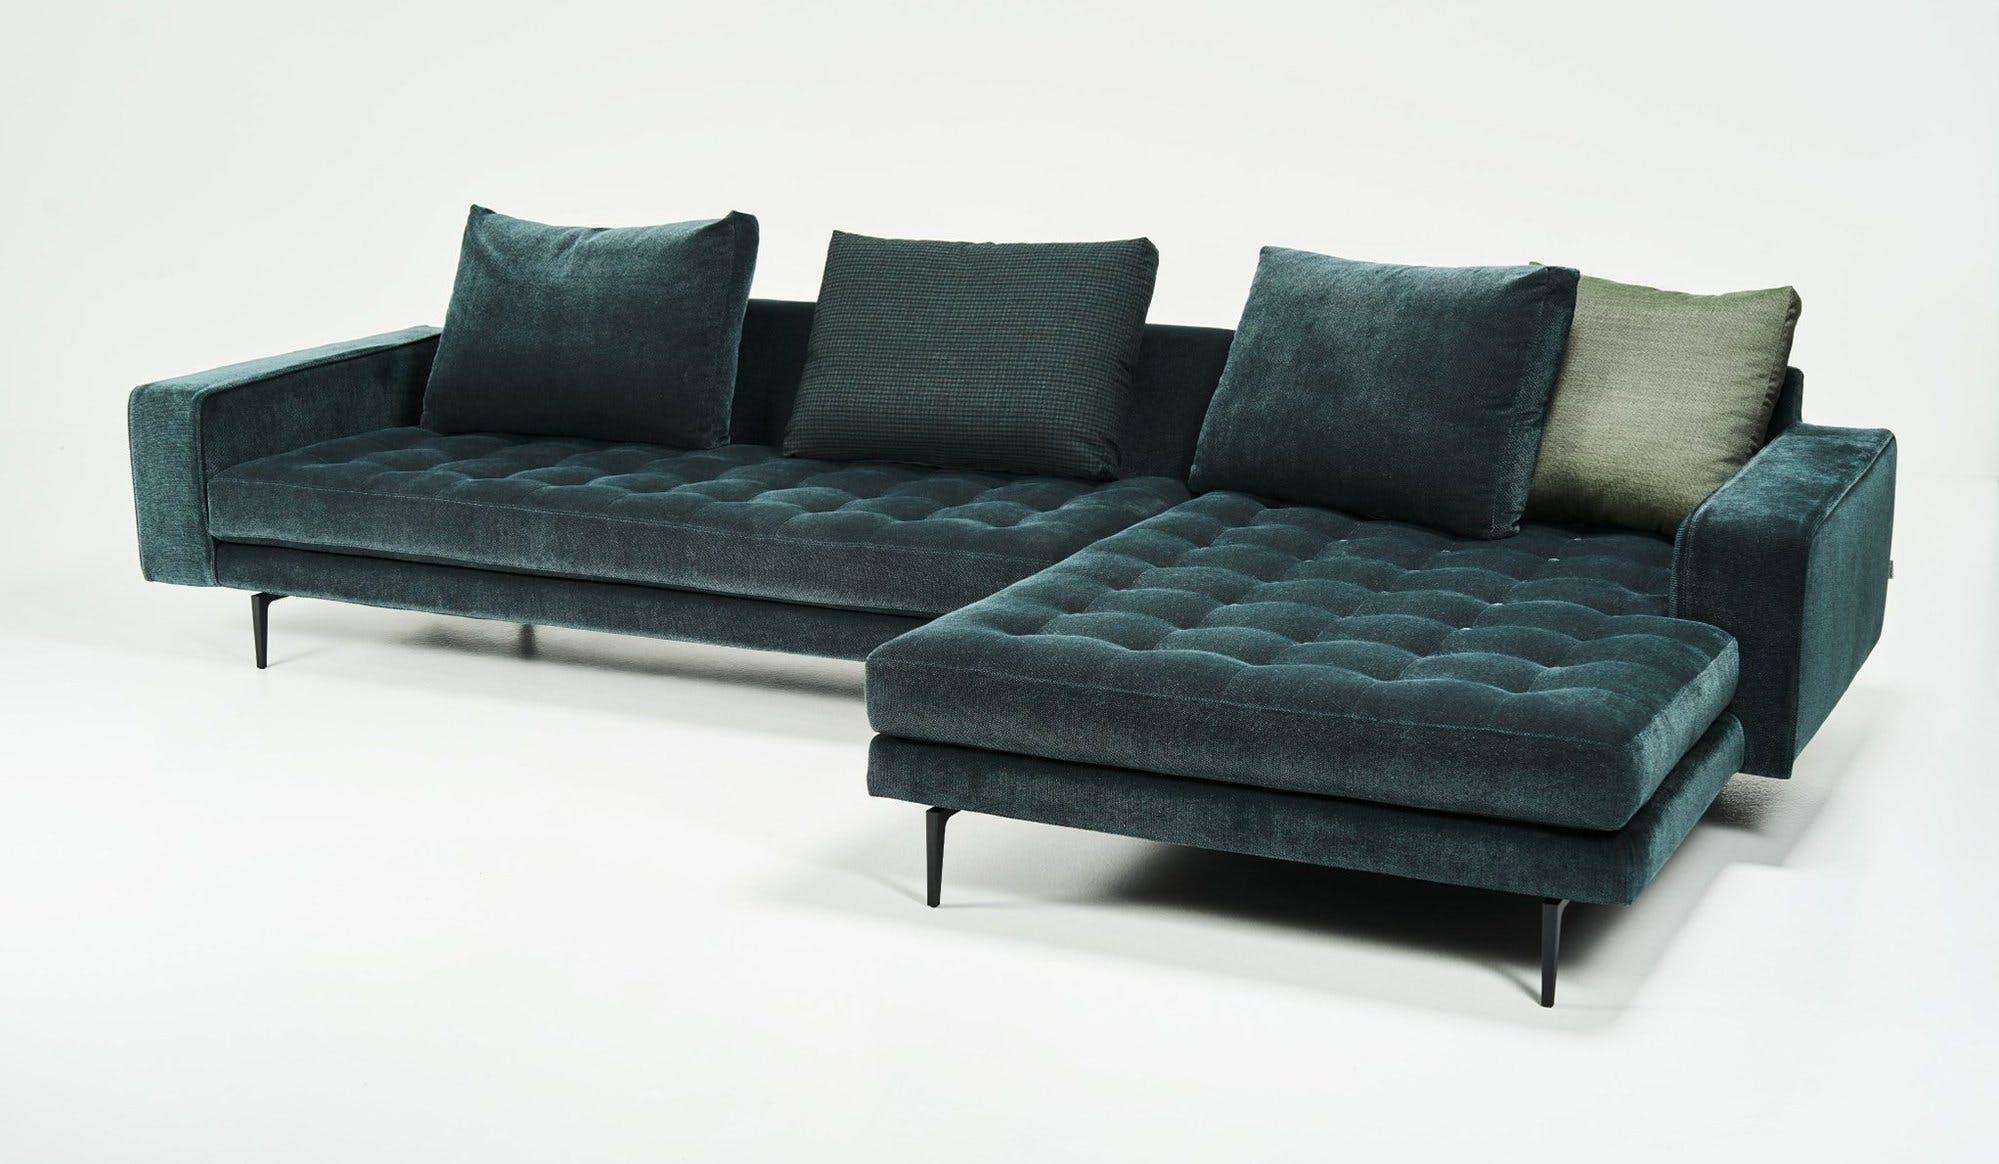 Wendelbo Campo Sofa1 2000X